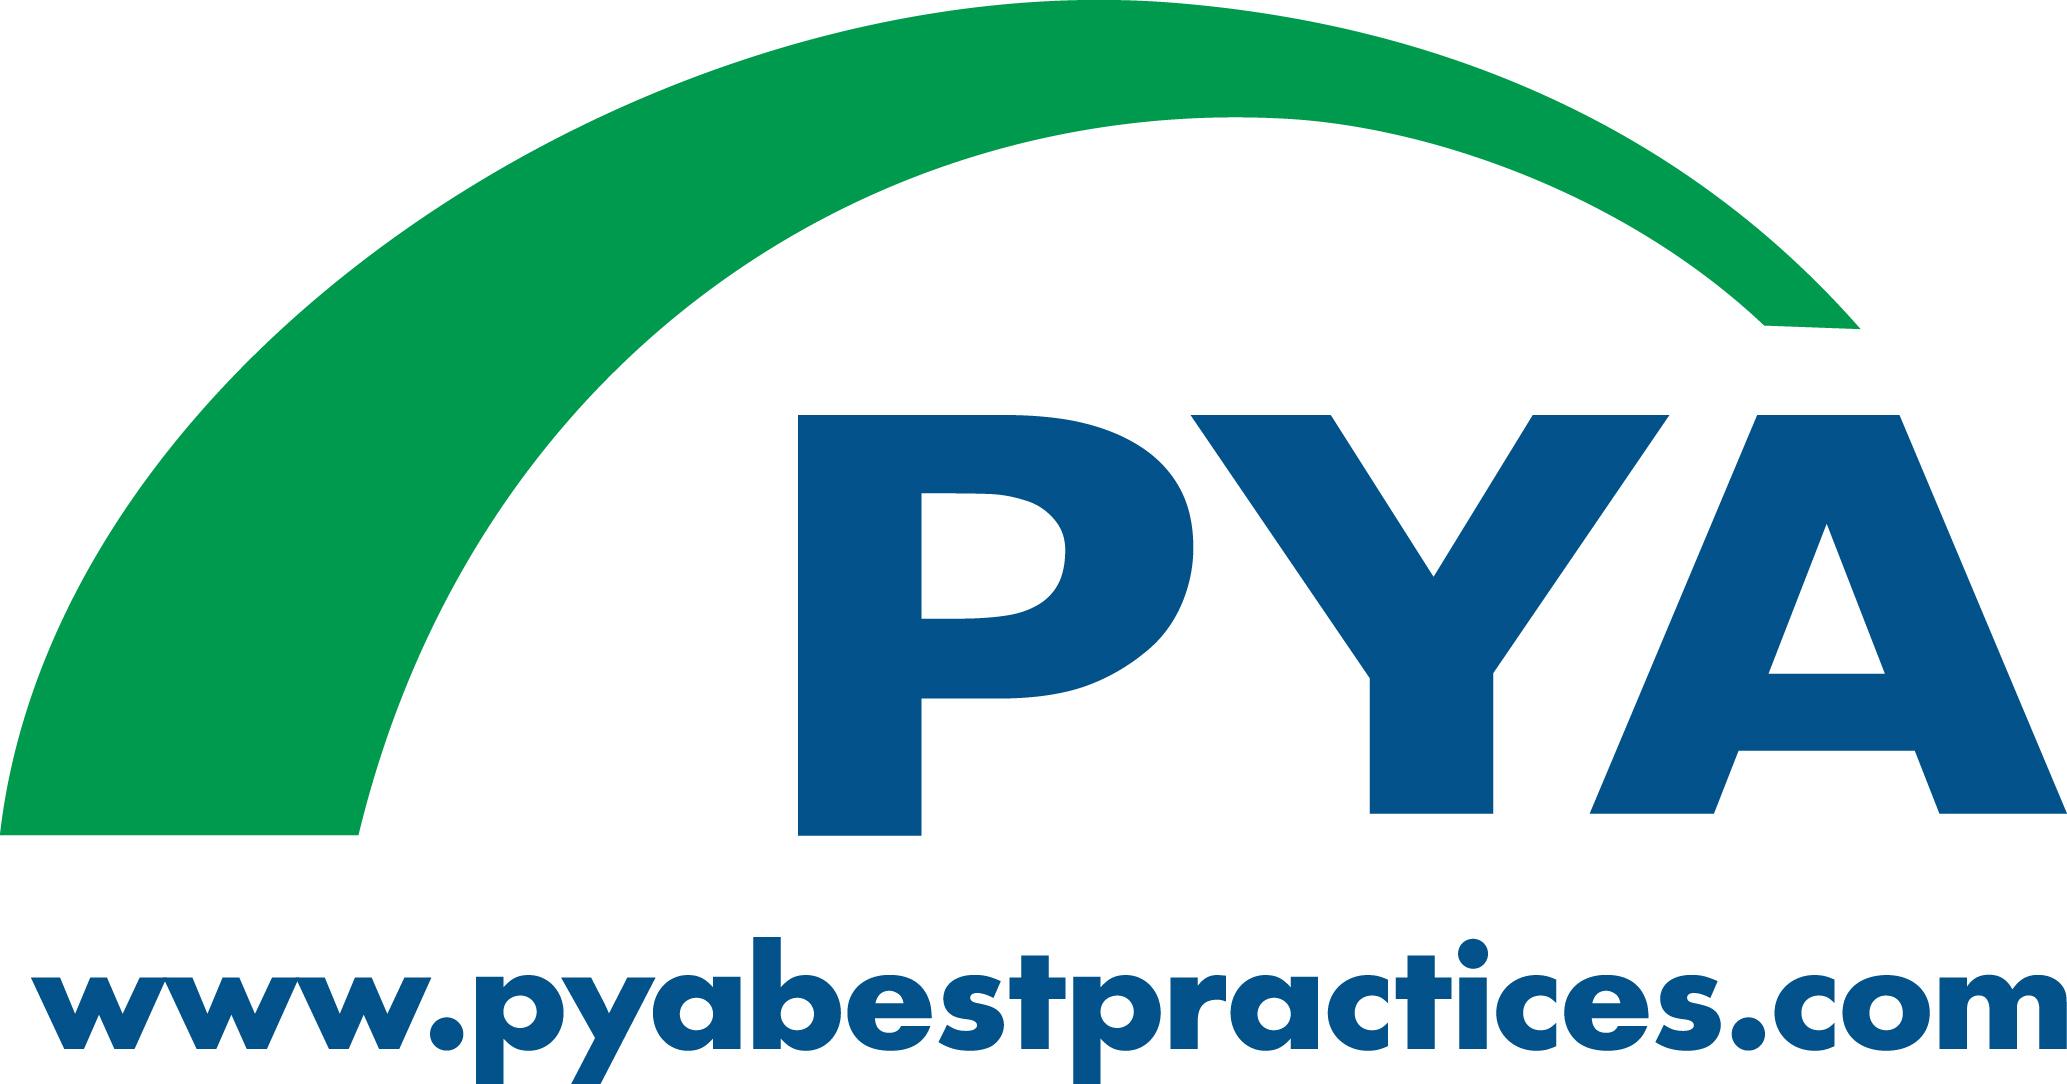 Pya Designated As Preferred Vendor Of Alta Best Practices Services